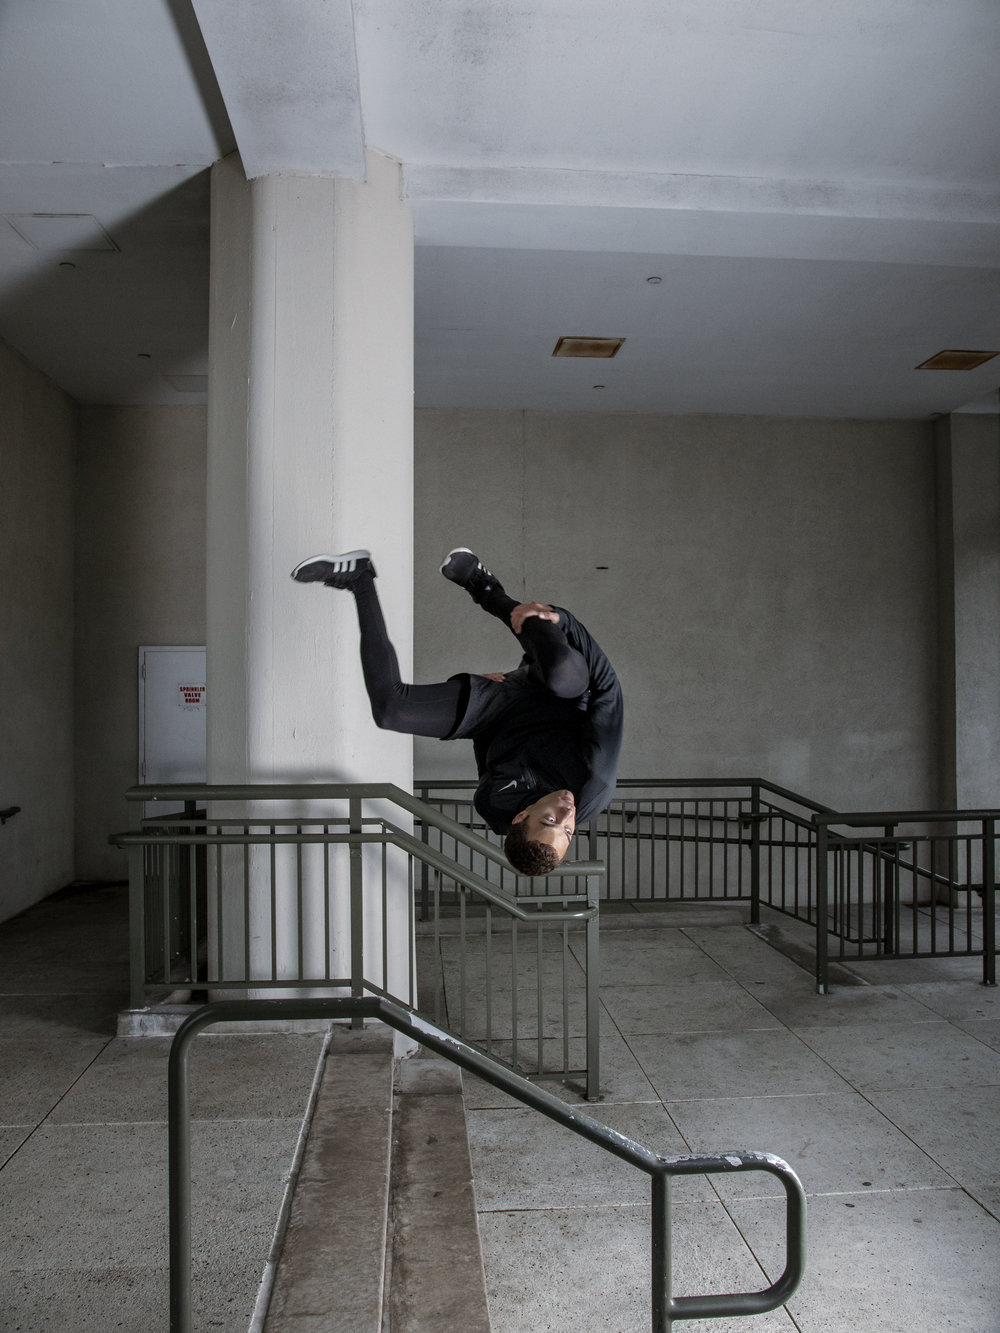 Miguel-Southee-Steve-Zavitz-Parkour-NYC-Freerunning-Spec-Sideflip-Nike